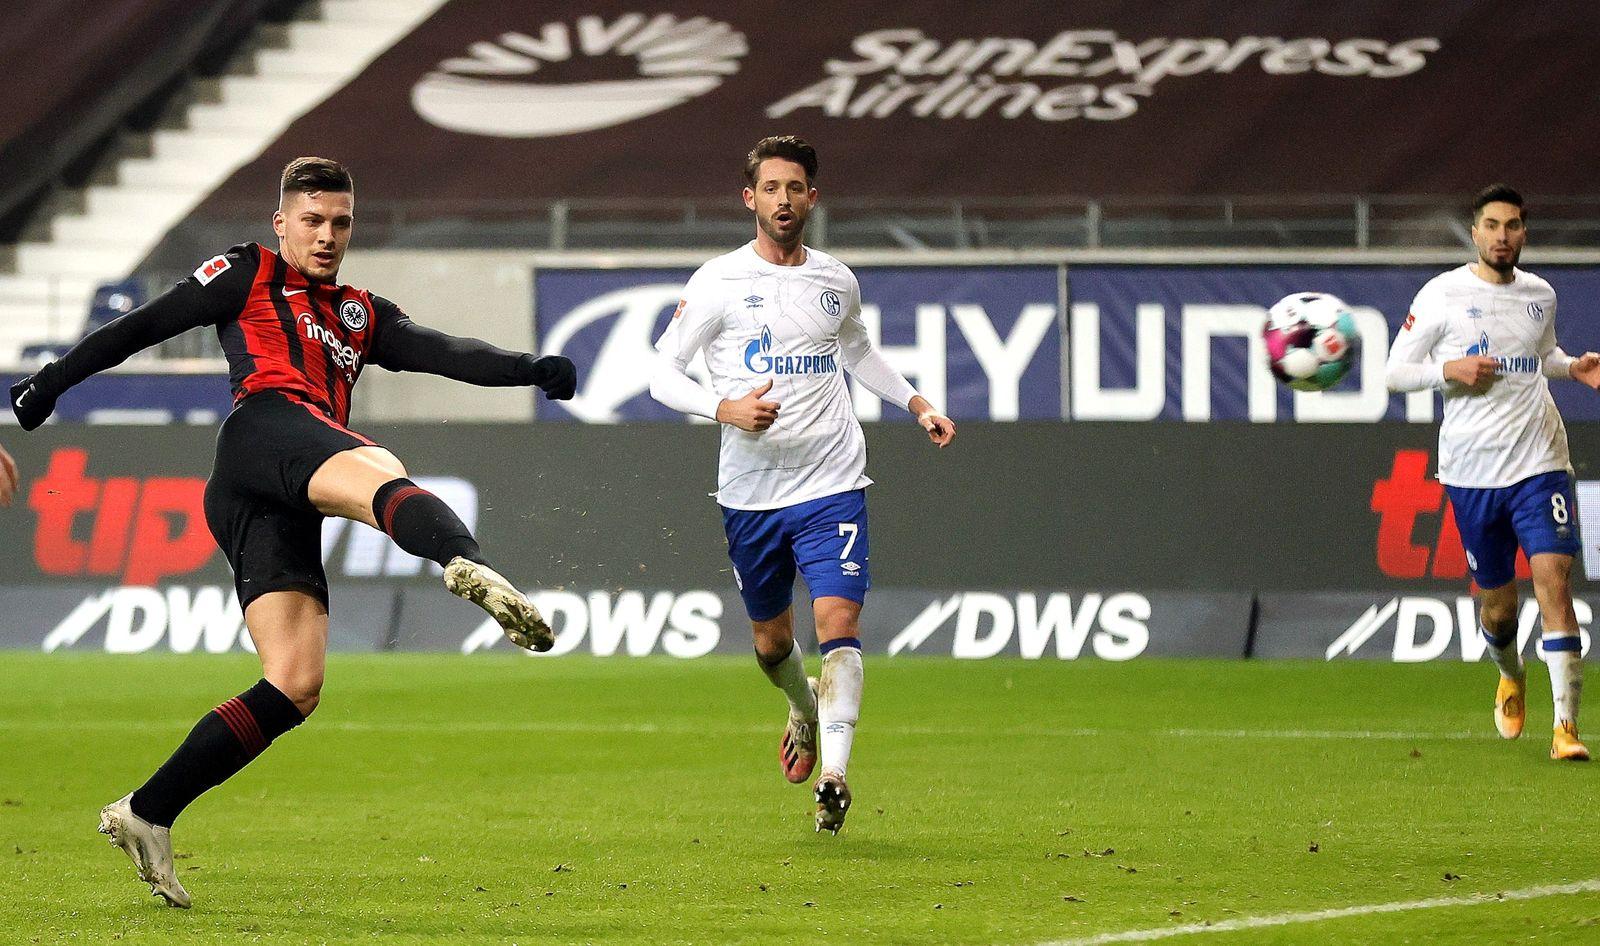 Eintracht Frankfurt vs FC Schalke 04, Germany - 17 Jan 2021